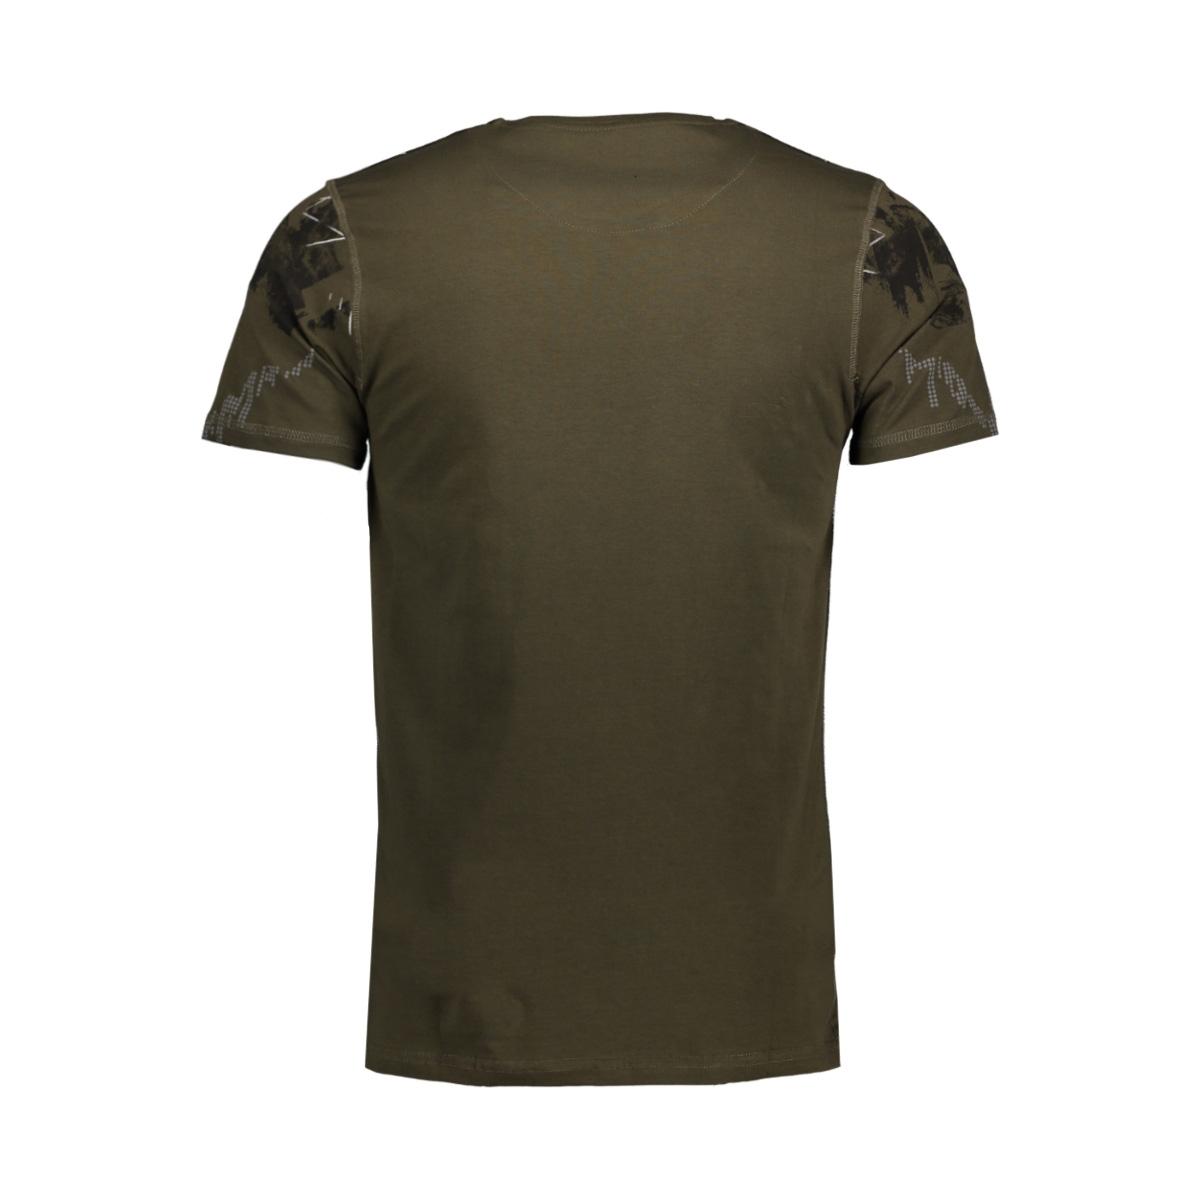 13881 gabbiano t-shirt army